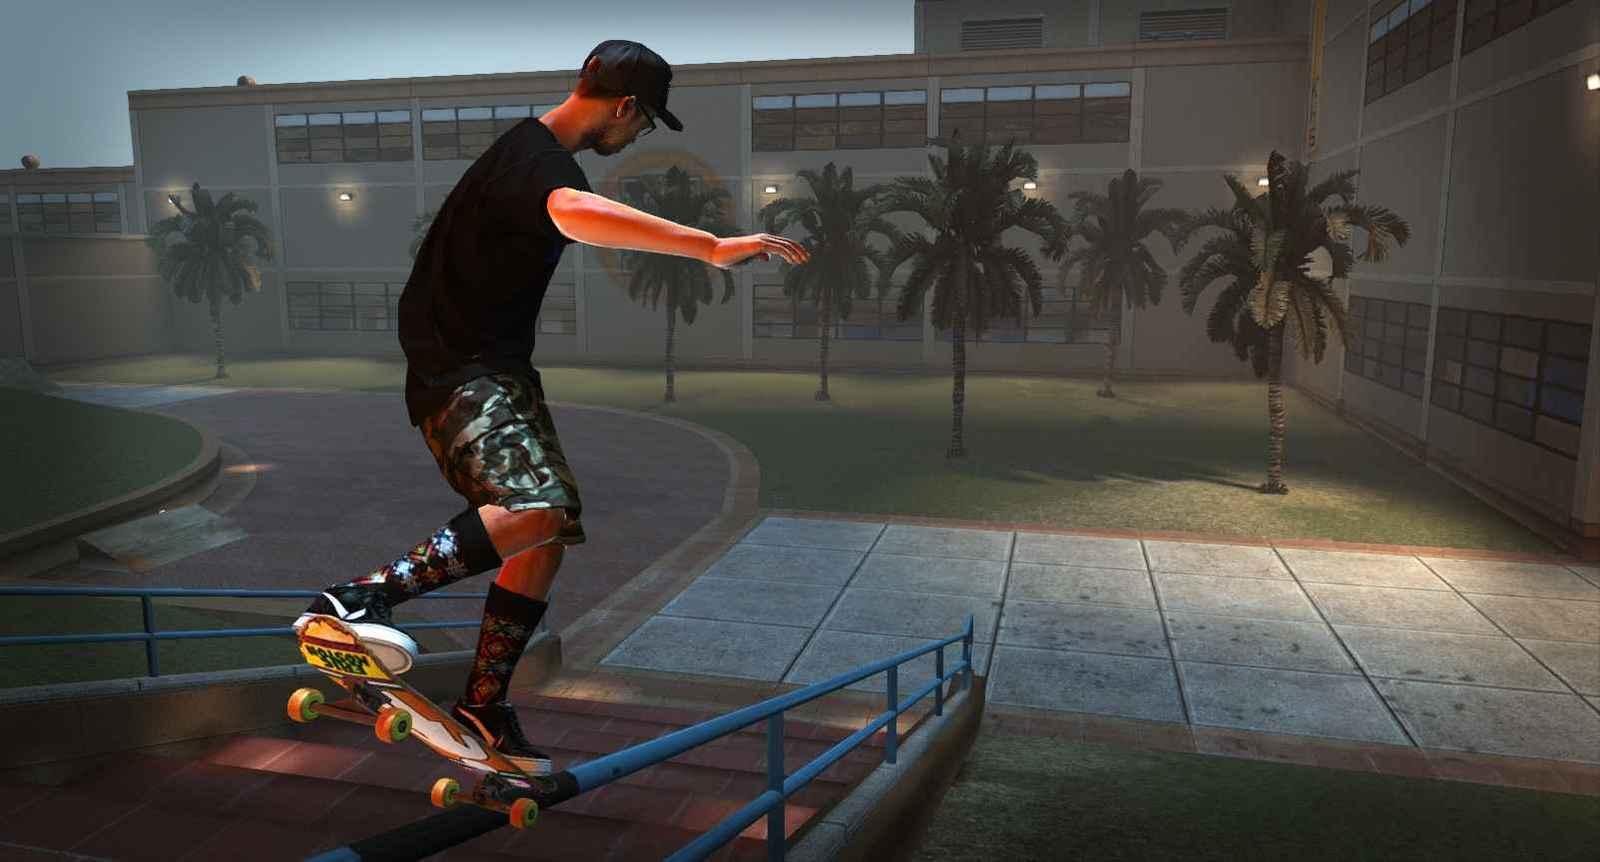 Tony Hawk's Pro Skater 1 & 2 for PS4 image